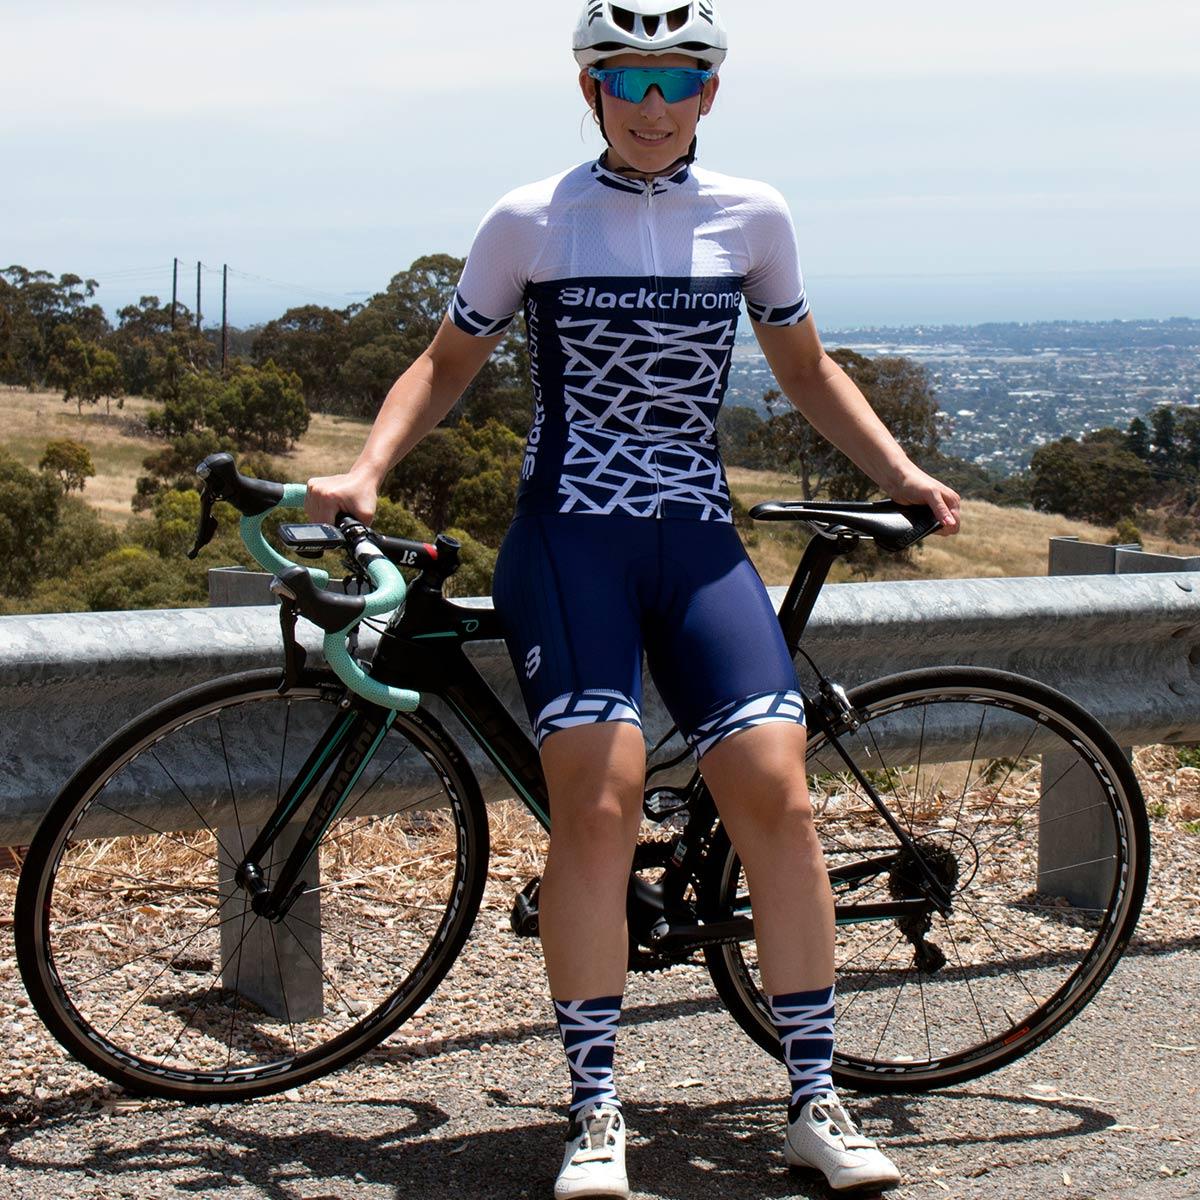 Womens-Thatcher-Pro-Fit-Cycling-Jersey-1-VL66937-Full-Kit-600x600 2x.jpg ... 5a0809591